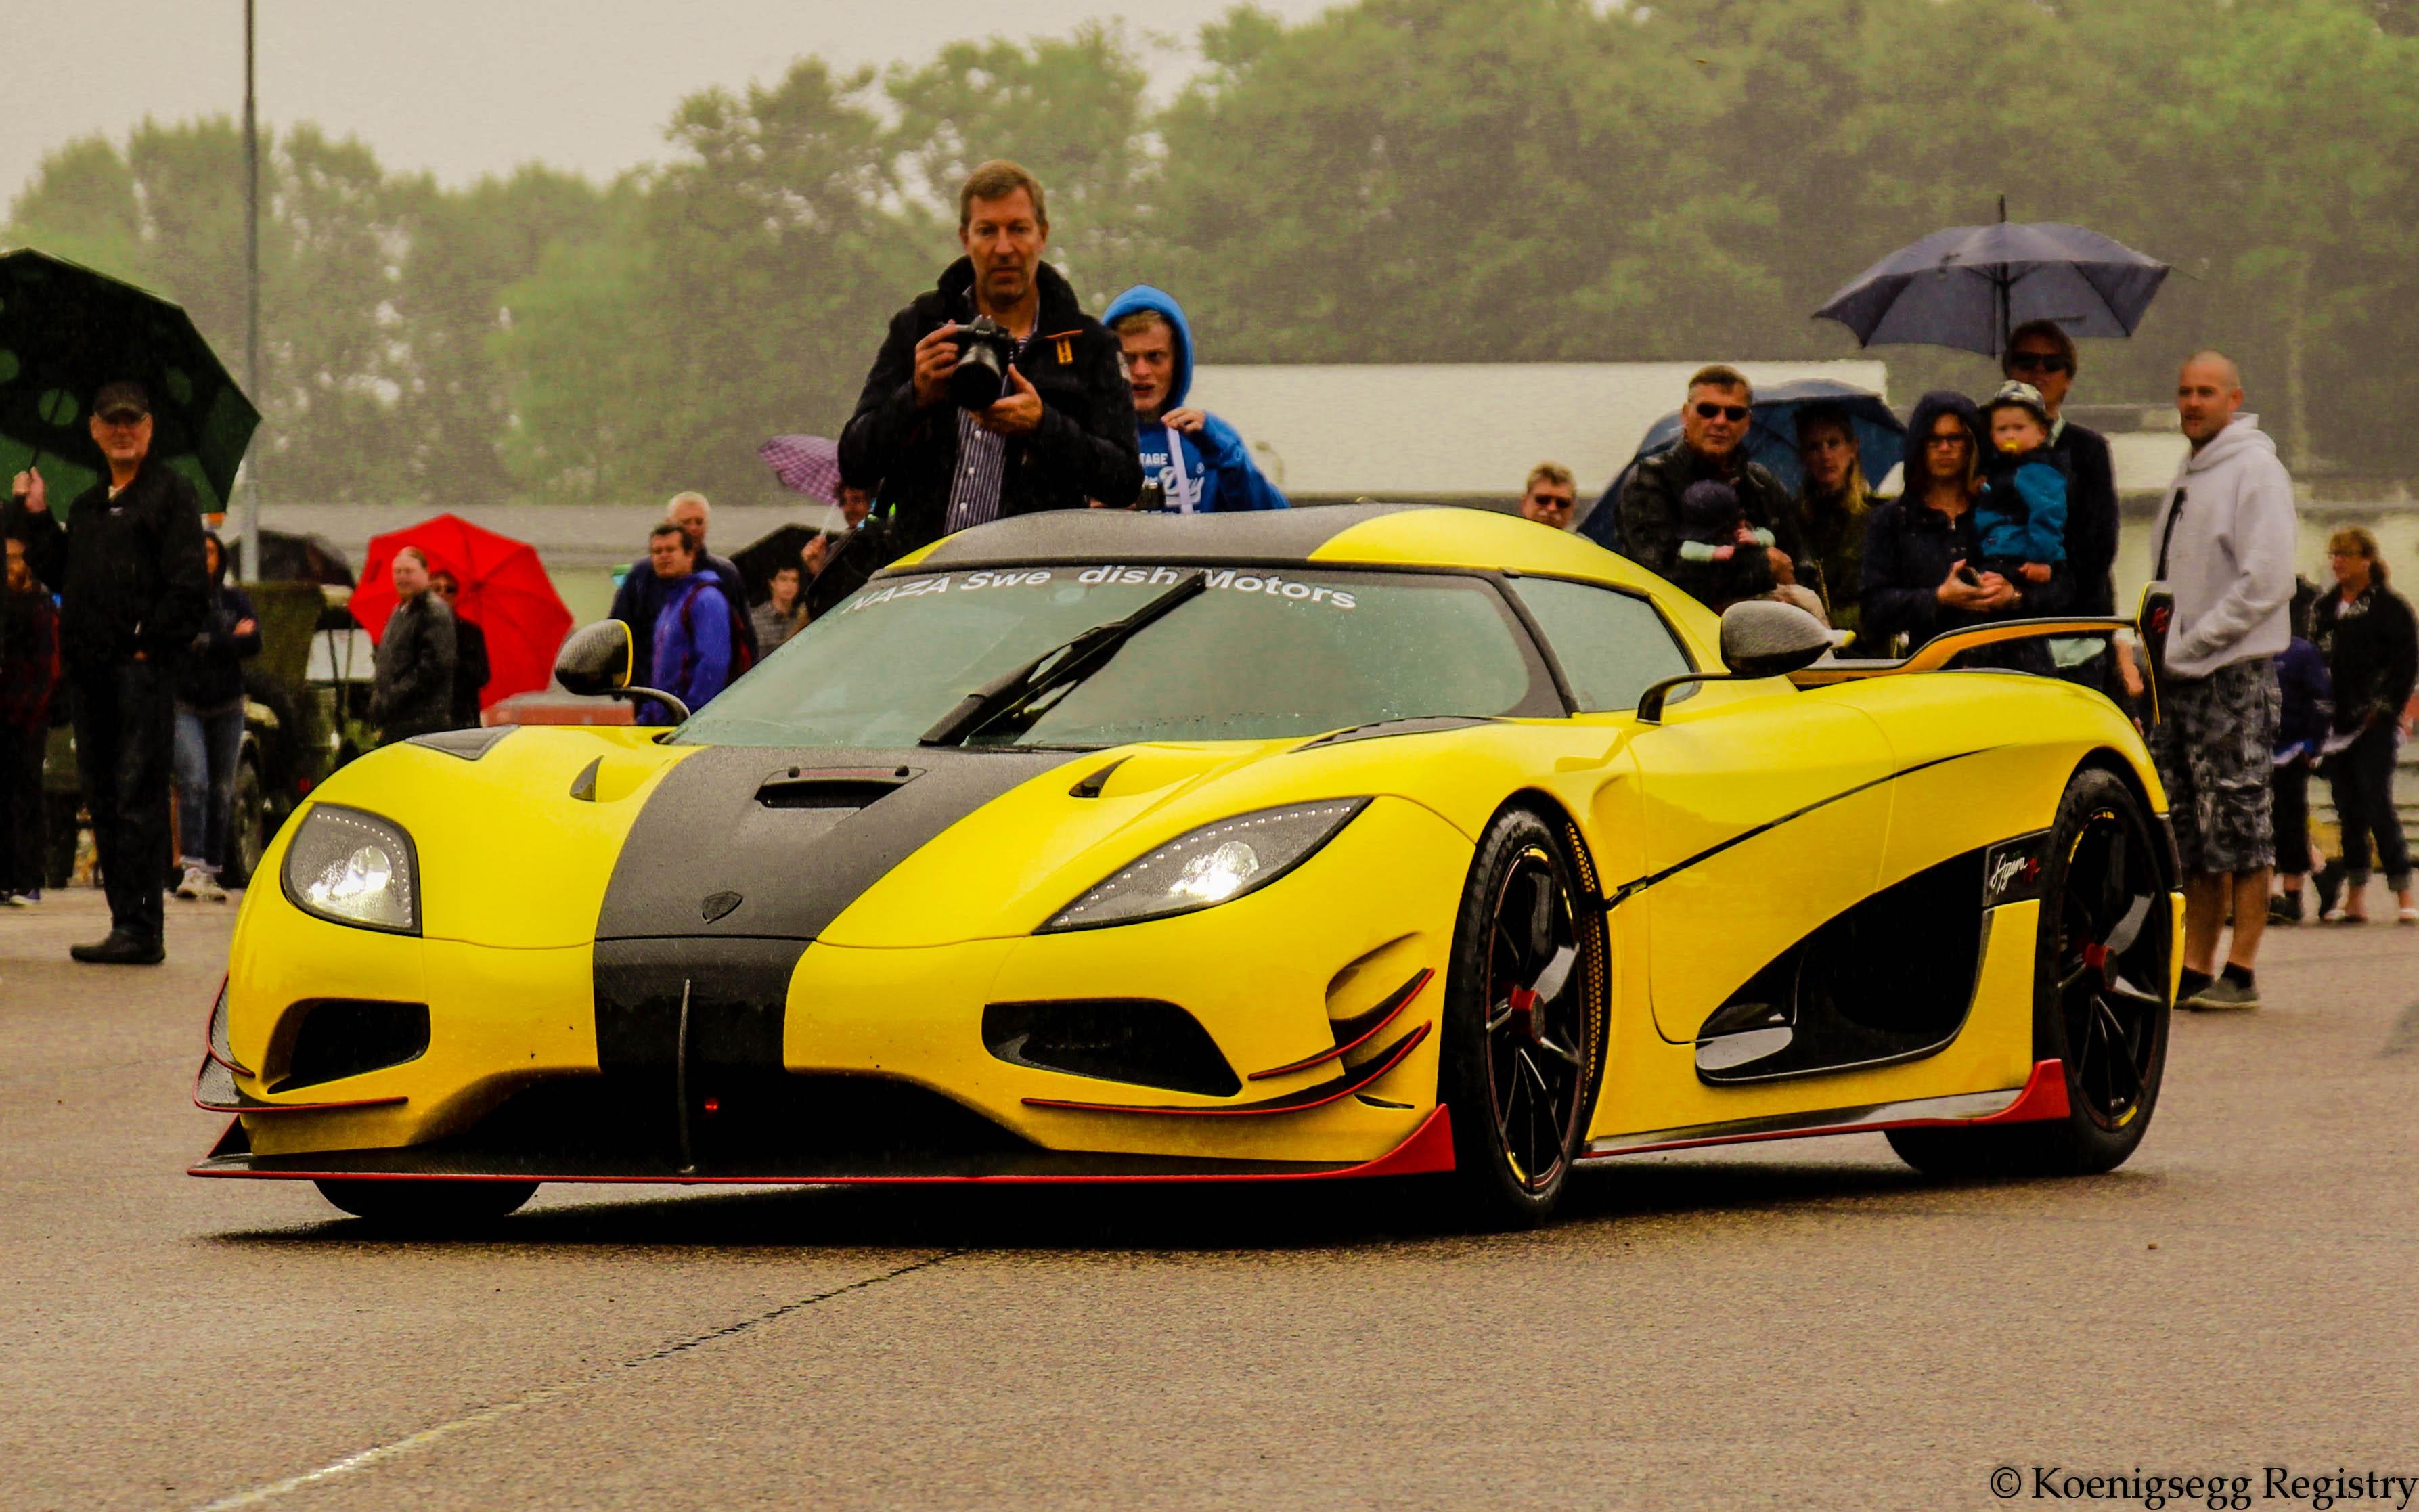 "#118 Agera RS ""ML"" - Loke Yellow w/red accents / black int. RHD-img_6069.jpg"